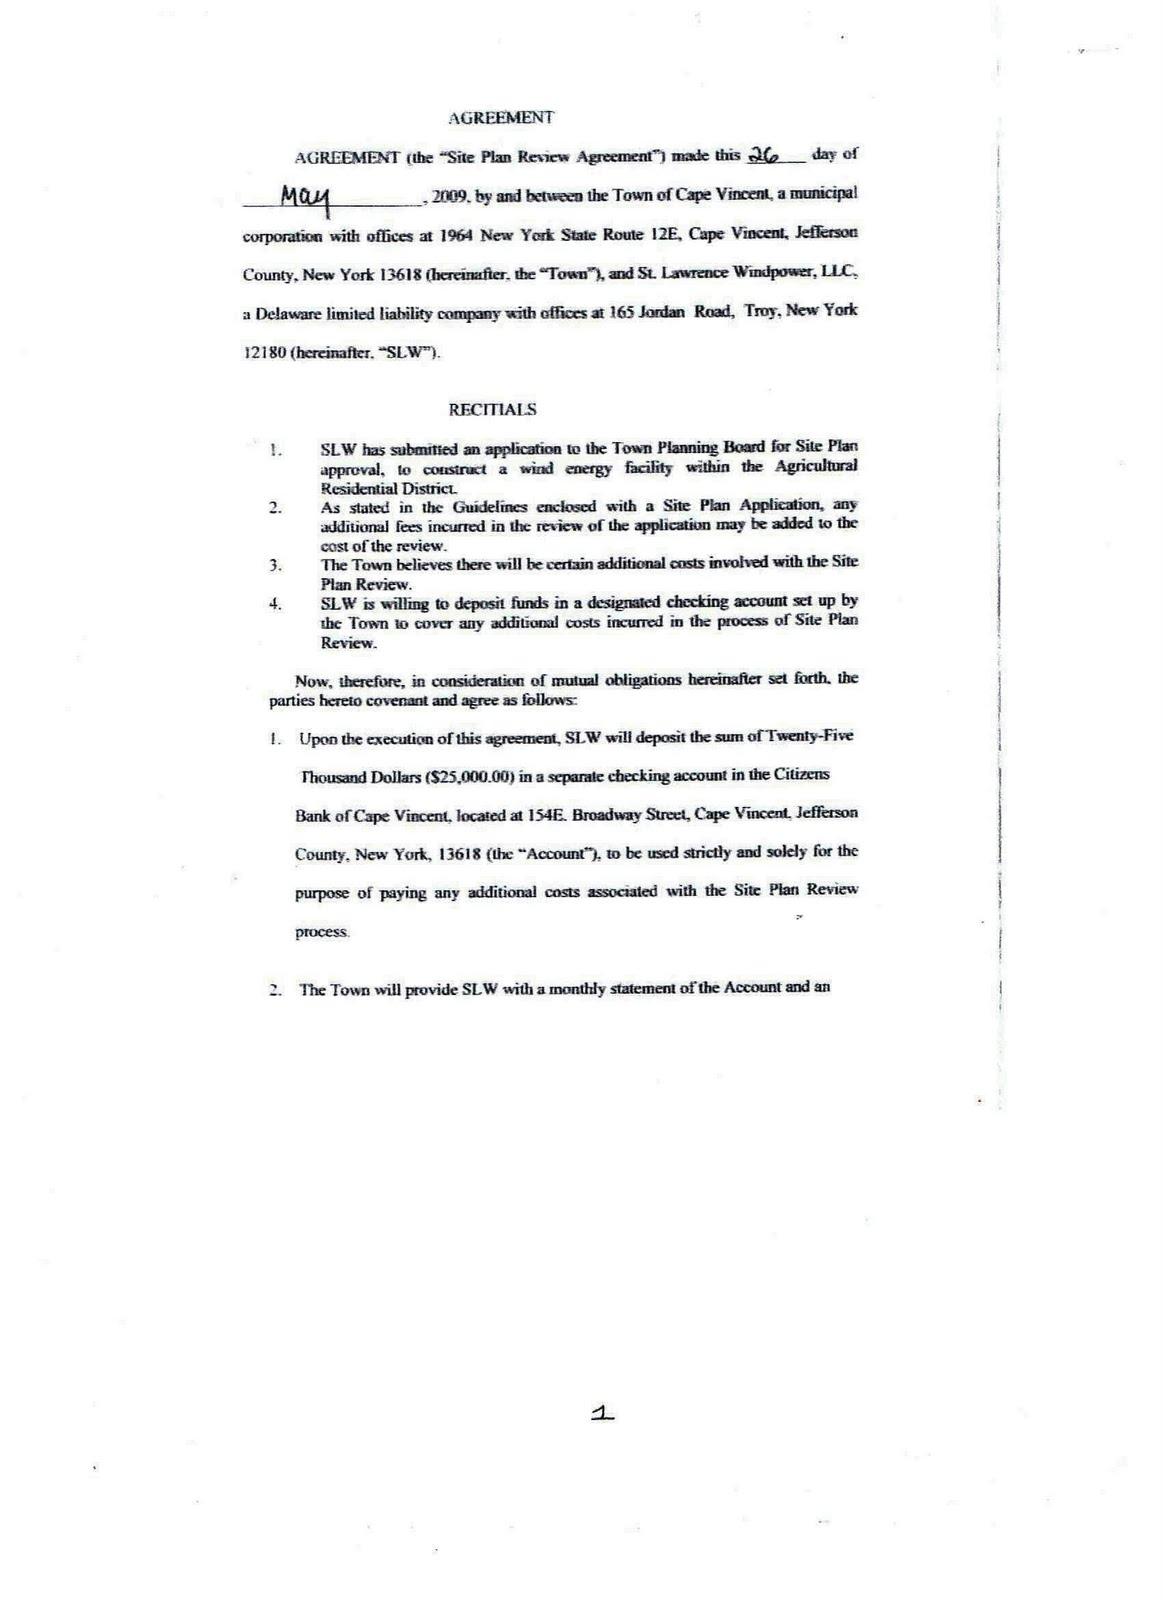 Pandoras Box Of Rocks Escrow Accounts Pay For Whiteman Osterman